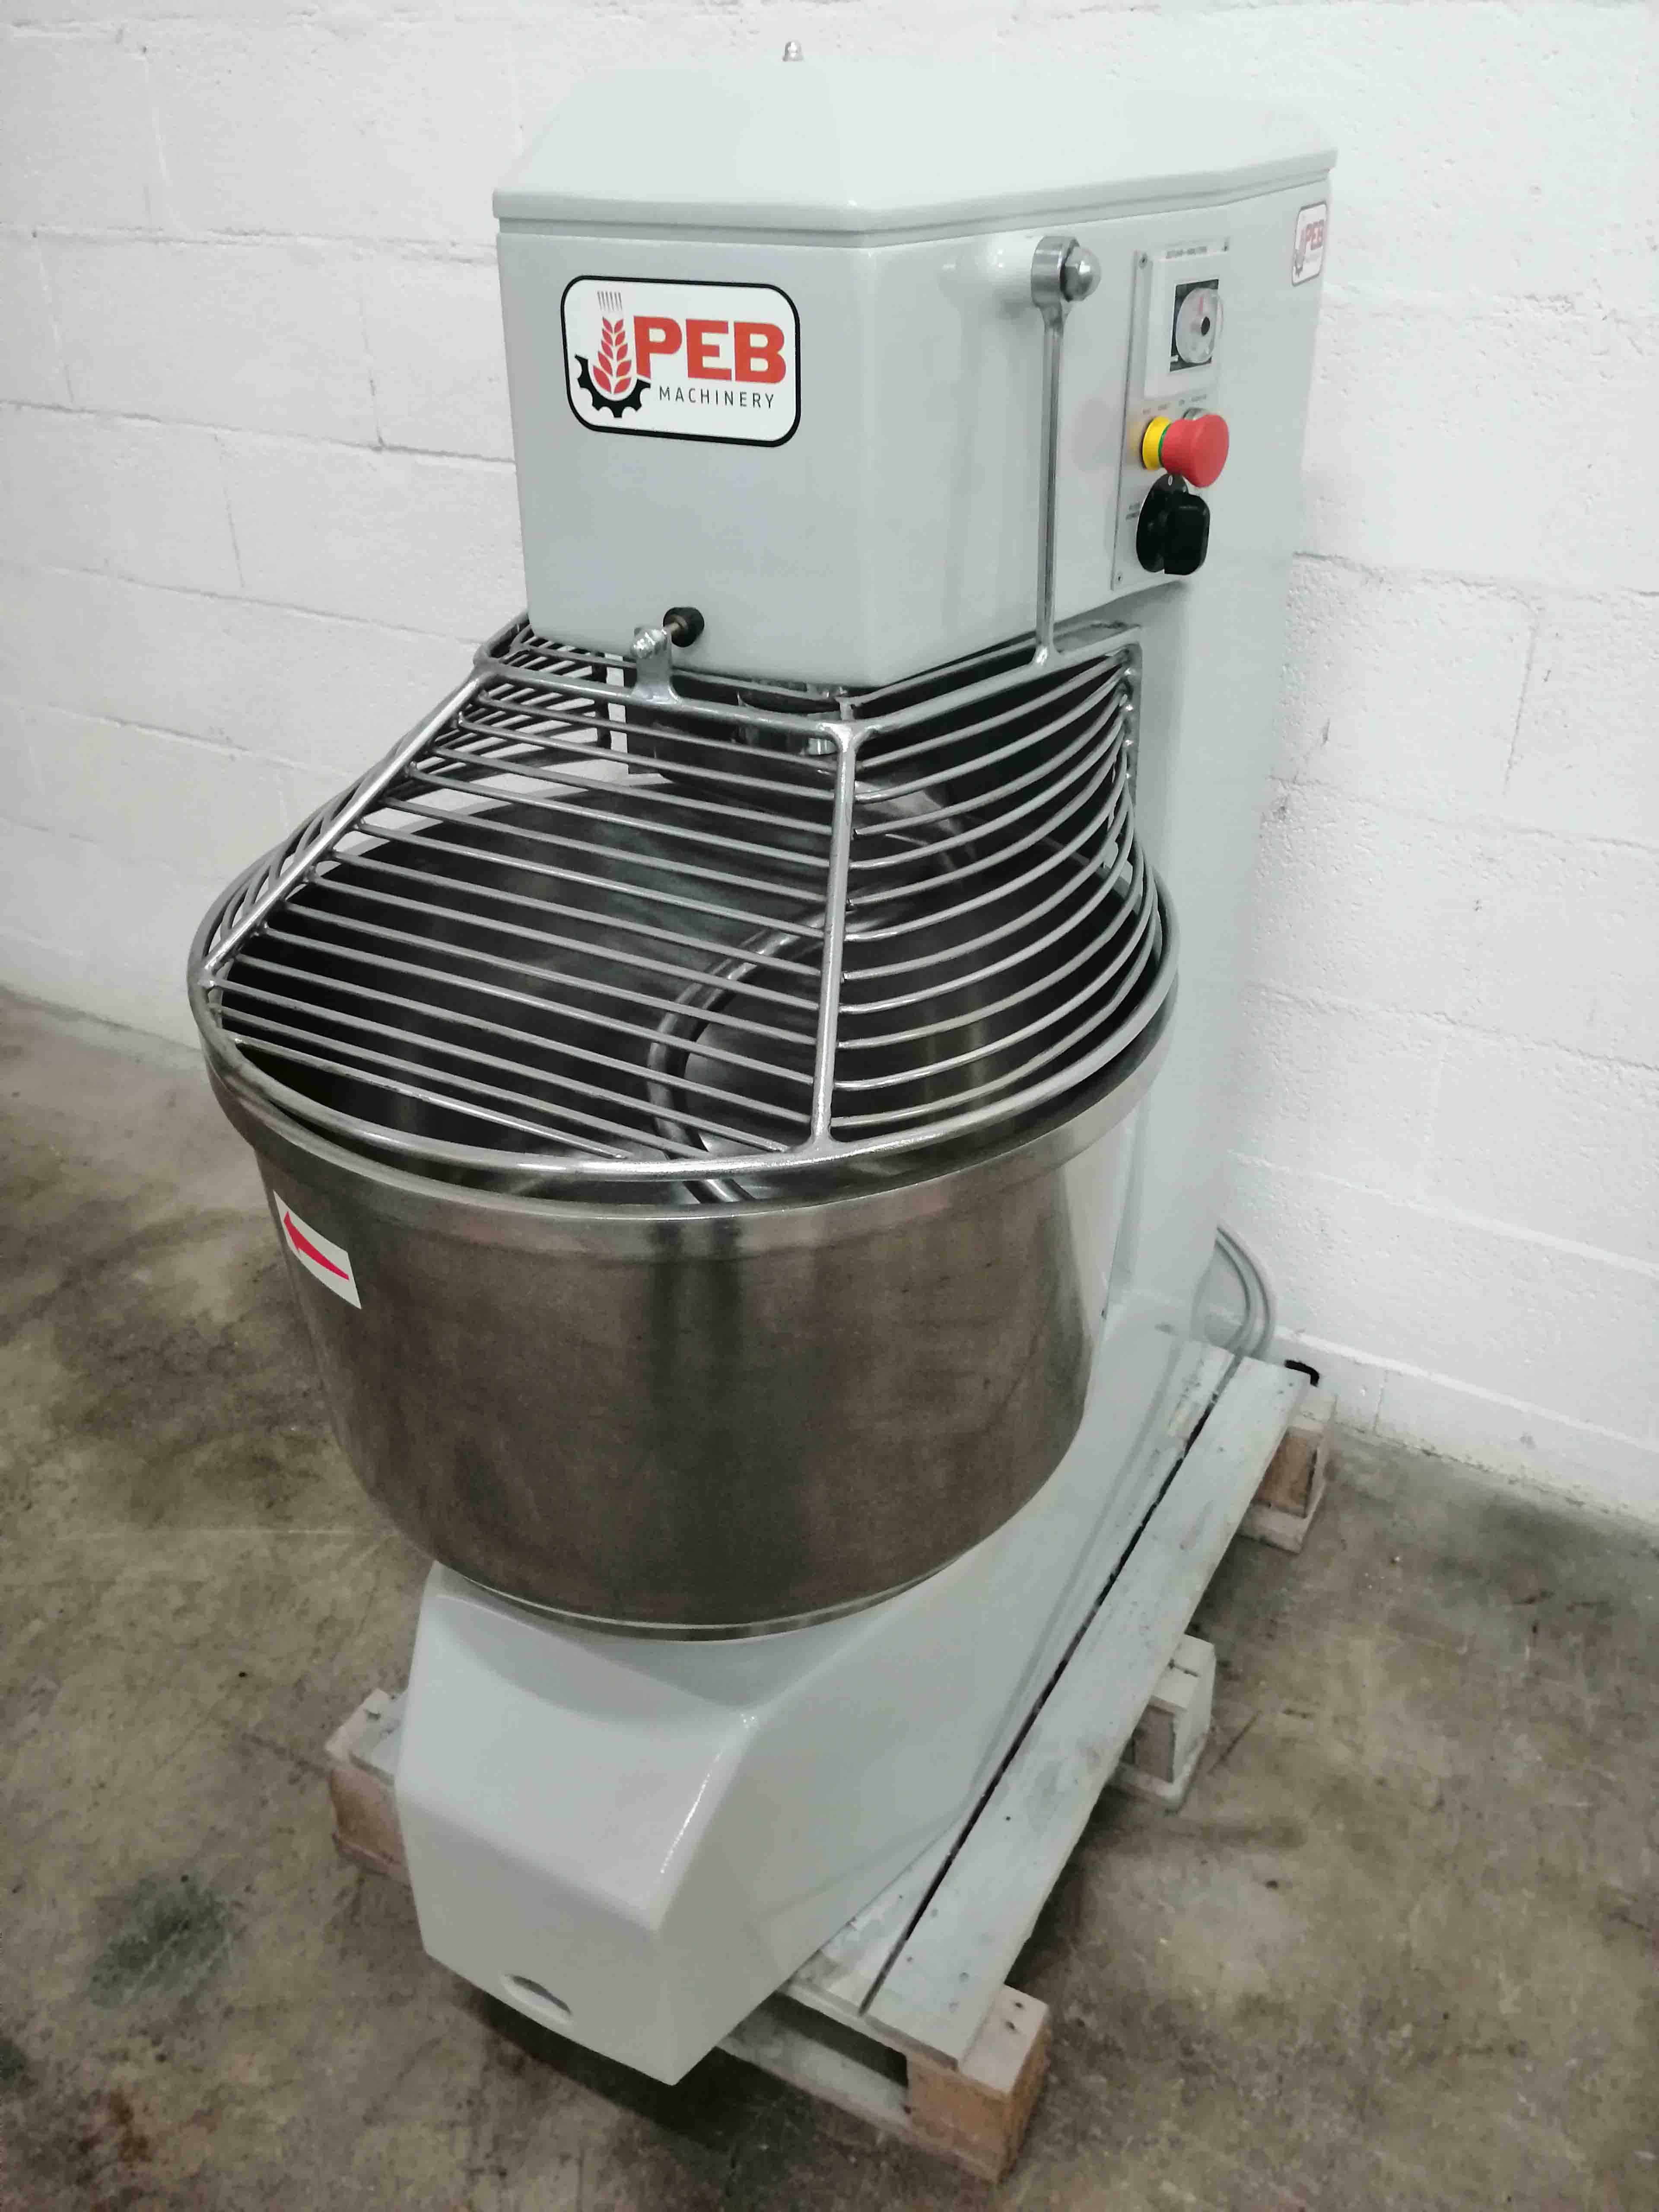 Impastatrice spirale PEB Machinery